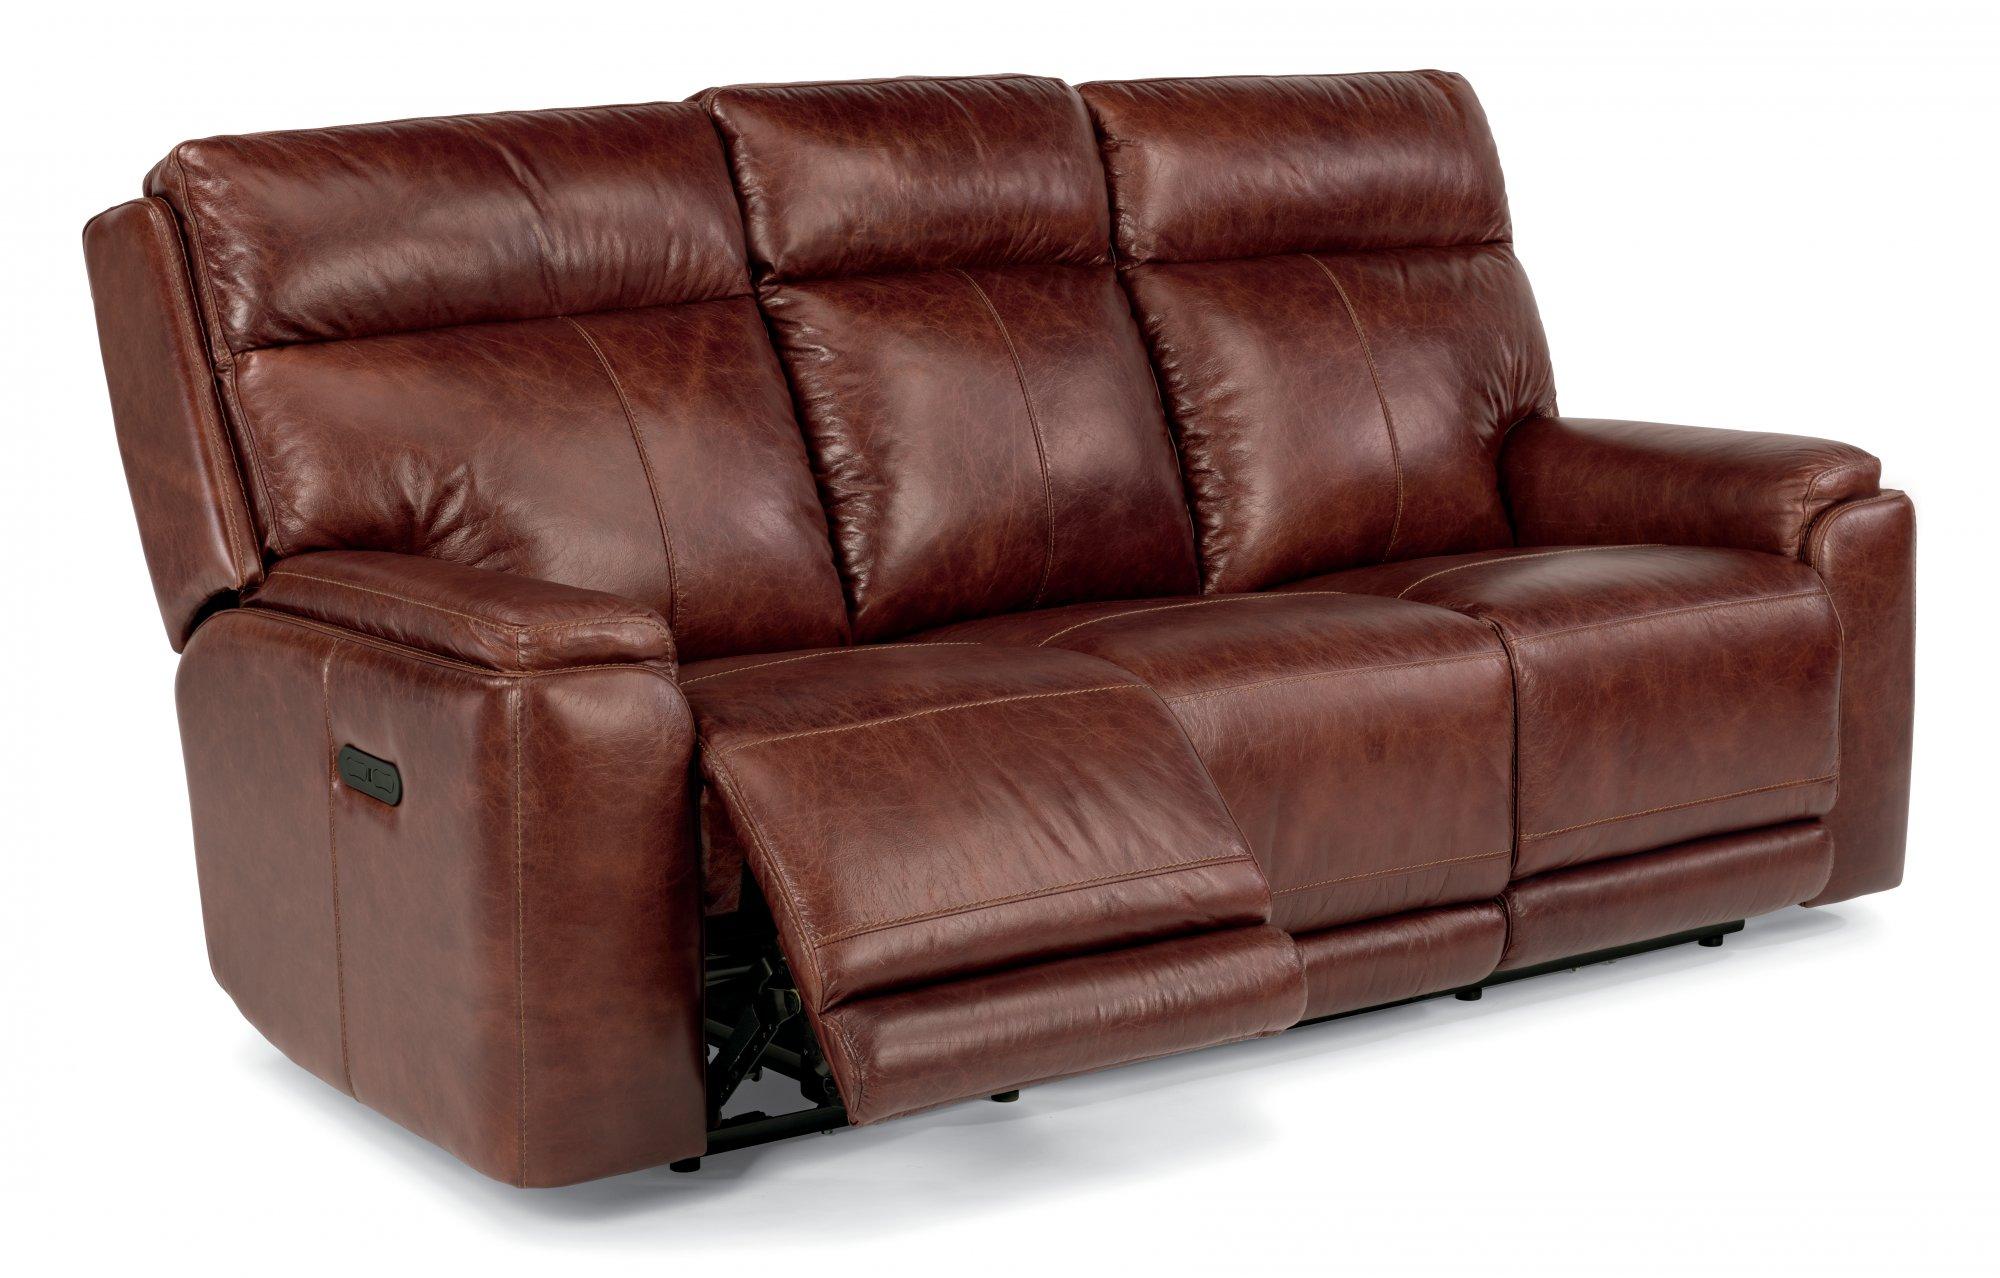 Flexsteel Sienna  Leather Power Reclining Sofa with Power Headrests